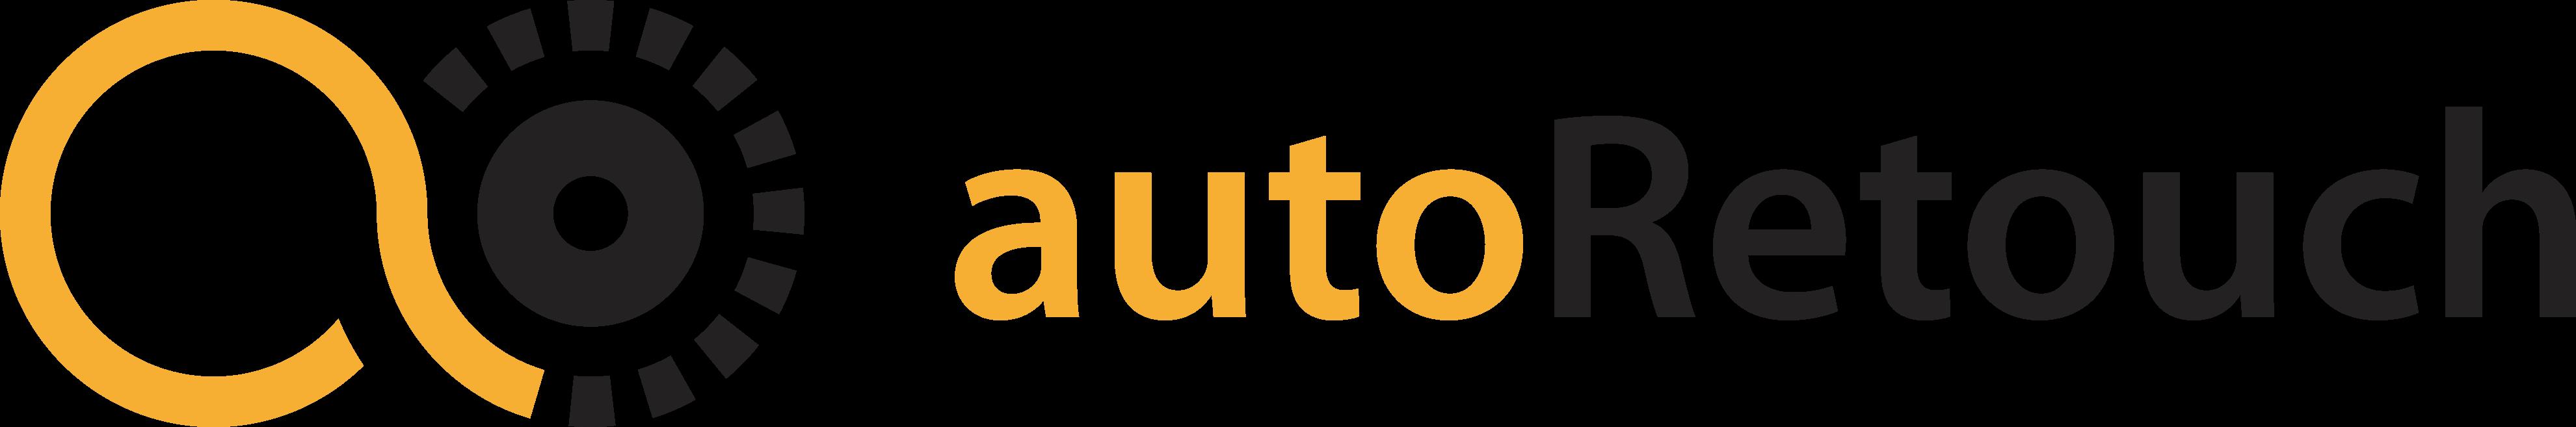 Auto Retouch logo